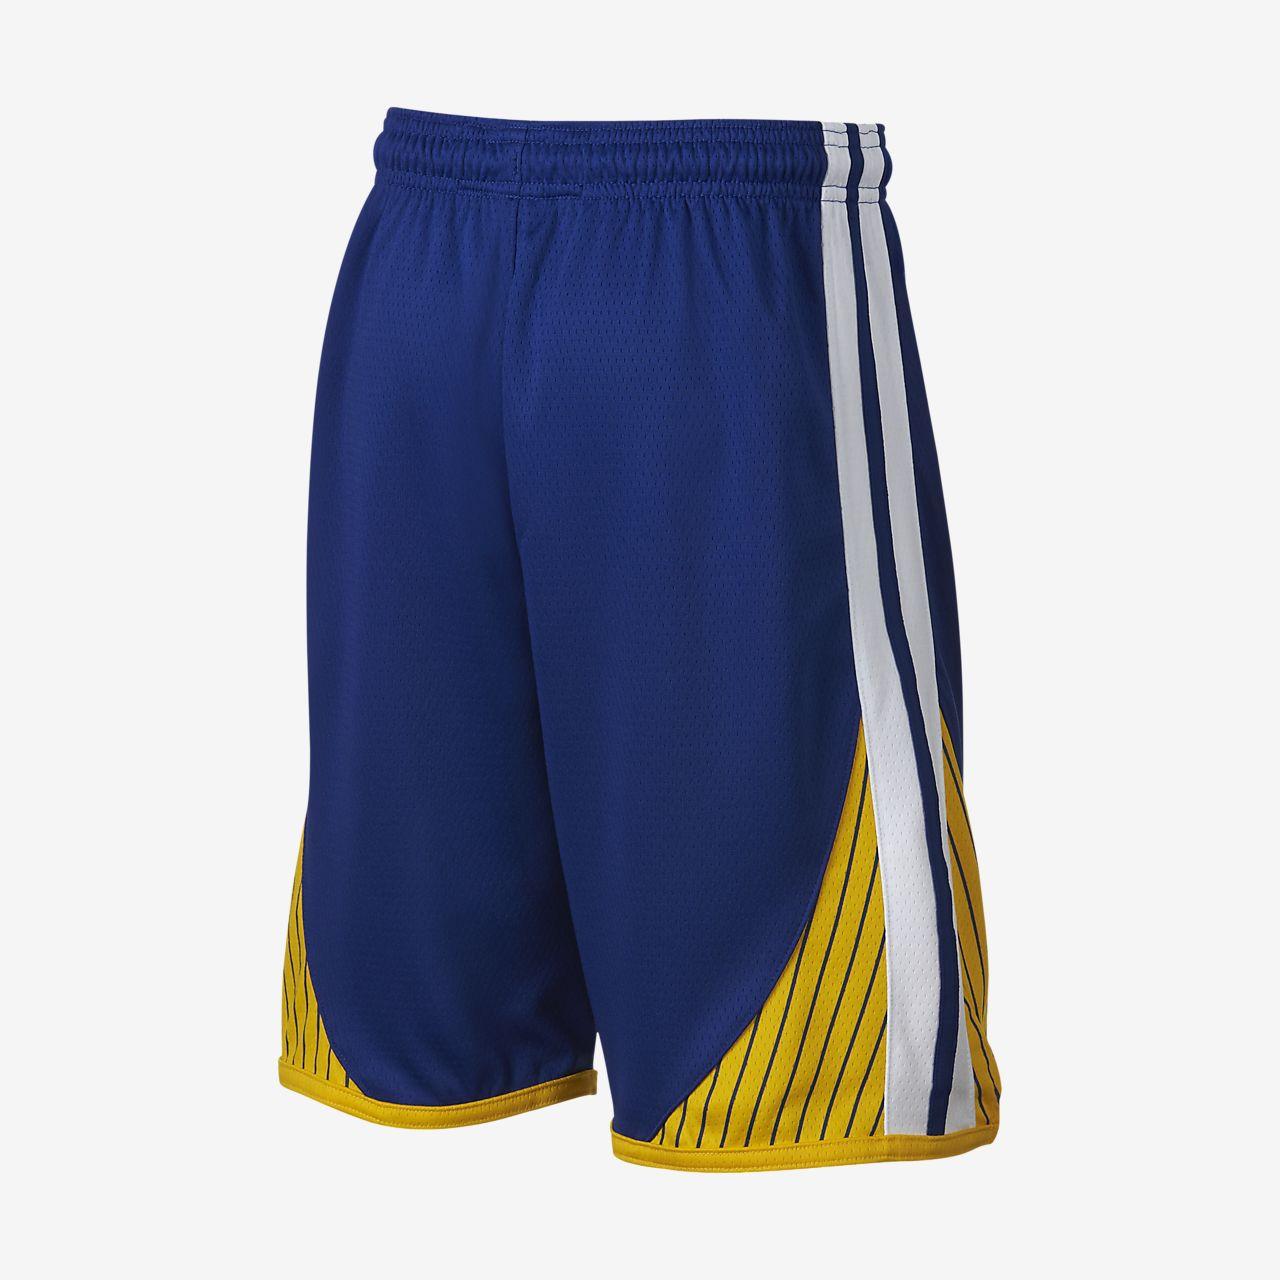 89f533cb87f2 ... Golden State Warriors Nike Icon Edition Swingman Big Kids  (Boys ) NBA  Shorts